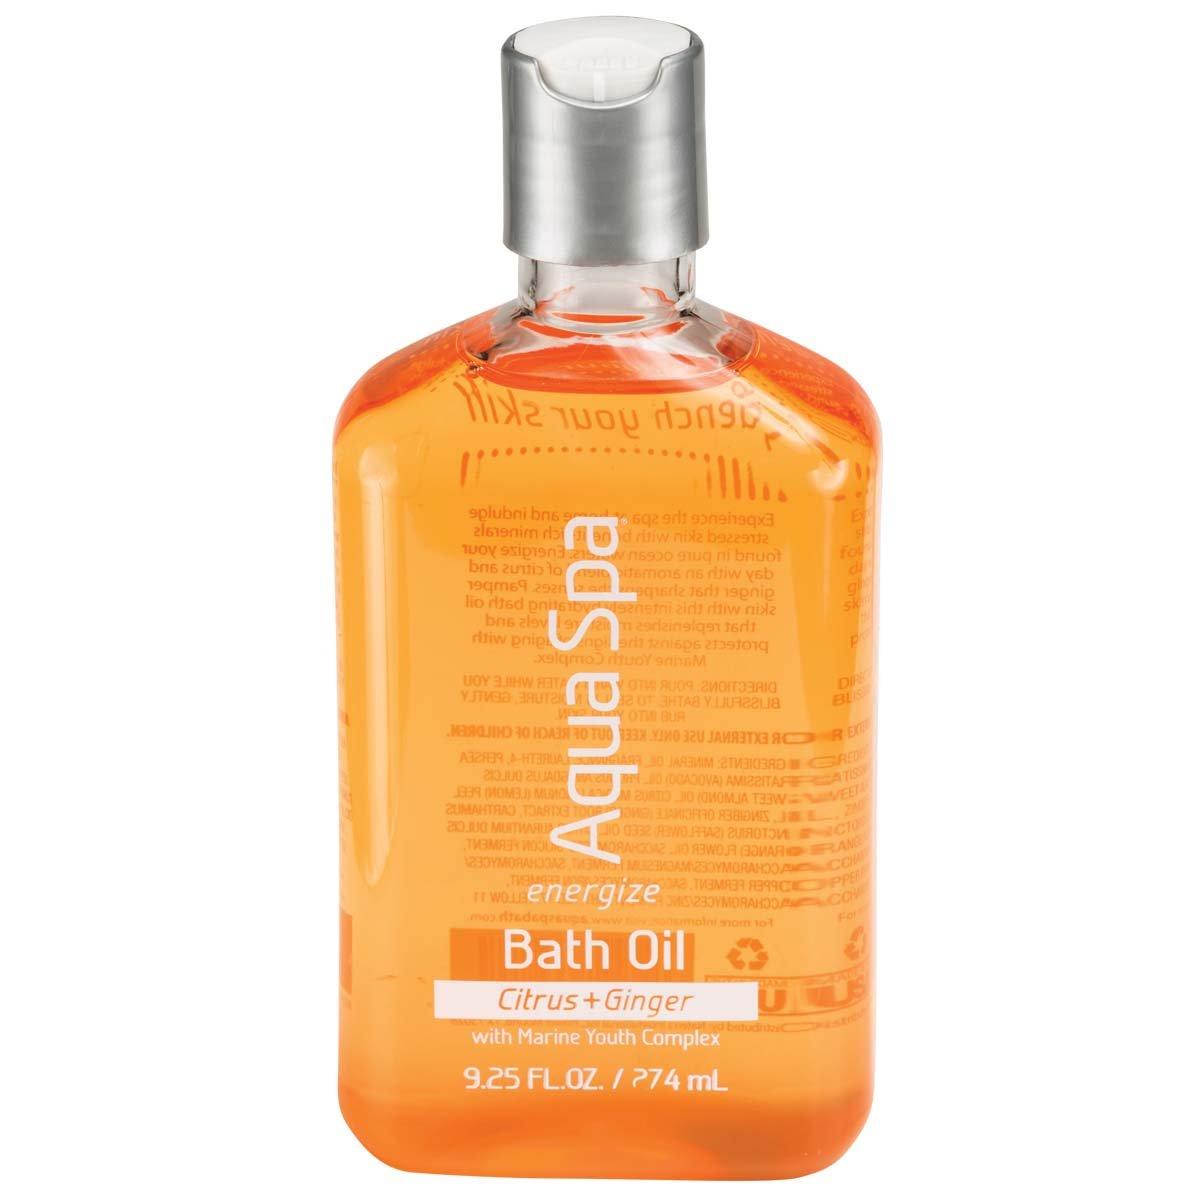 Aqua Spa Energize Bath Oil, 9.25 Fluid Ounce: Beauty